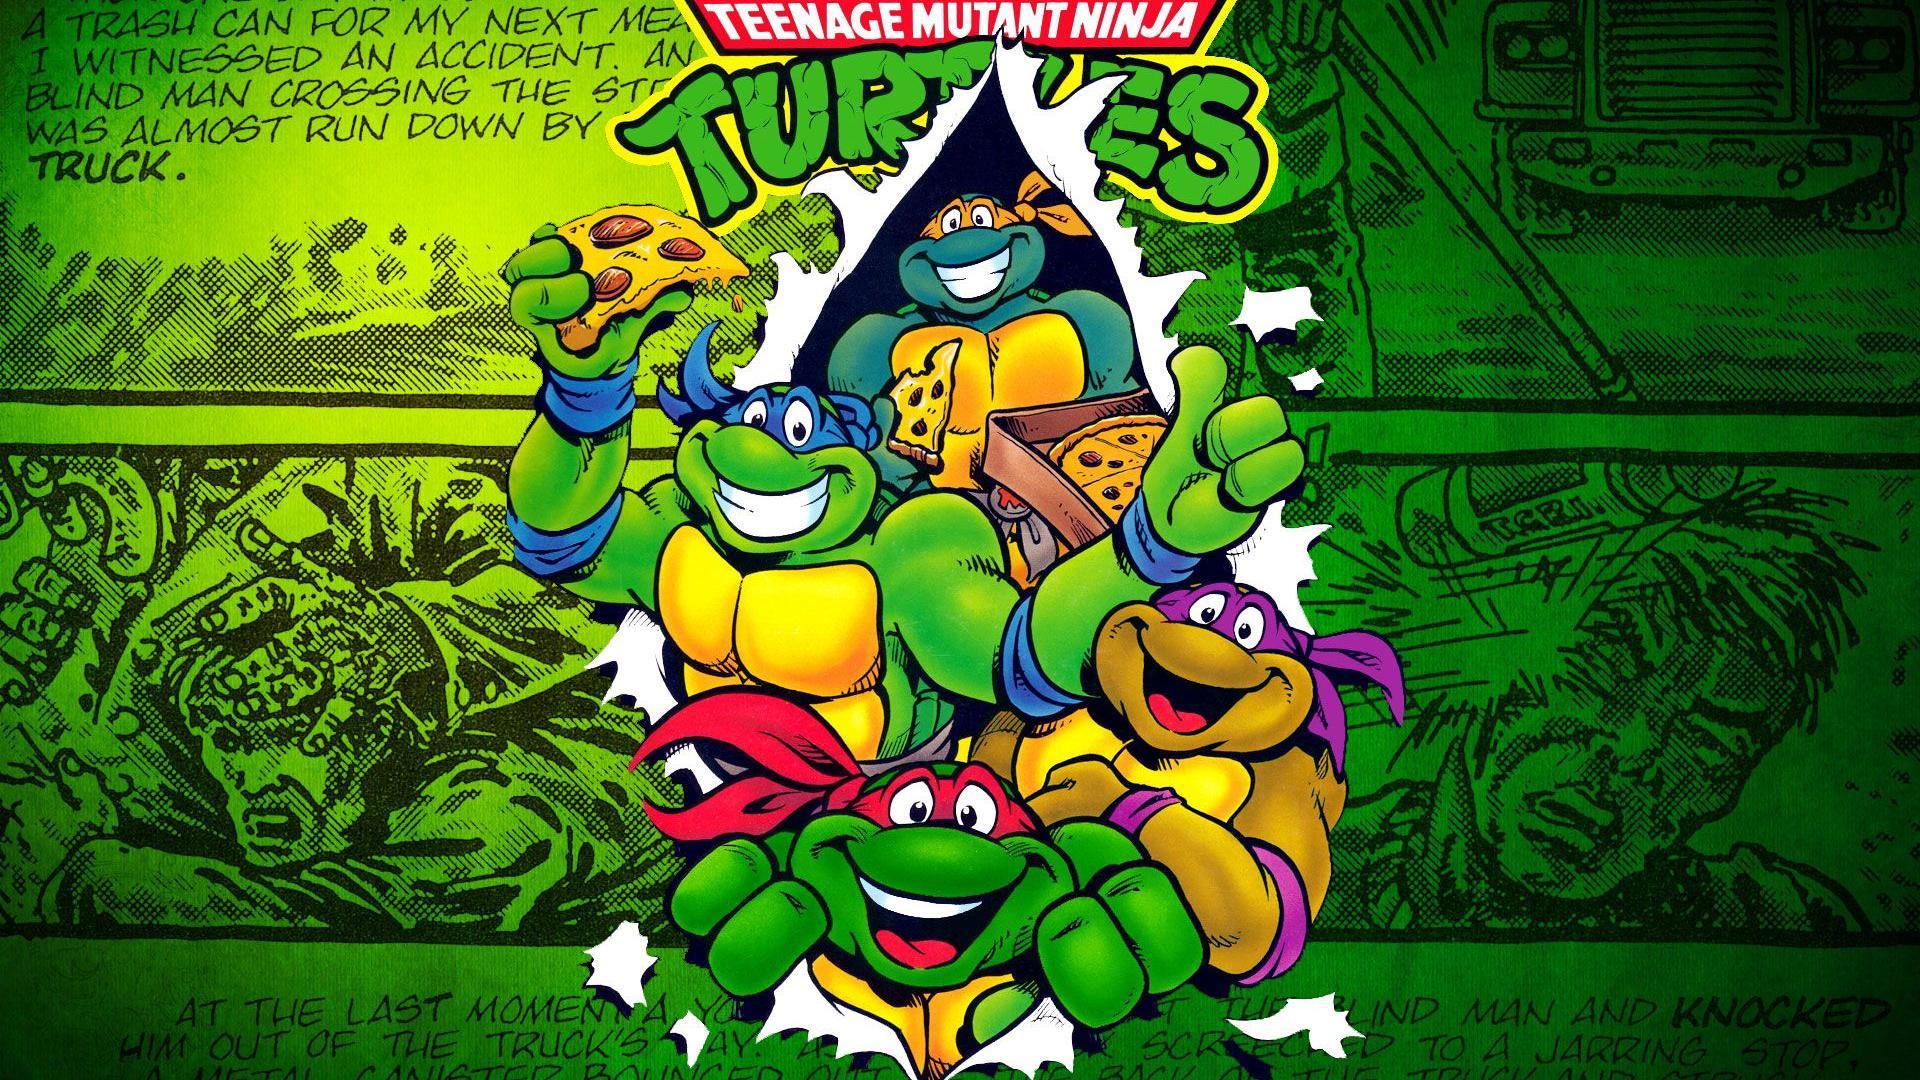 Teenage mutant ninja turtles comic wallpaper - photo#3